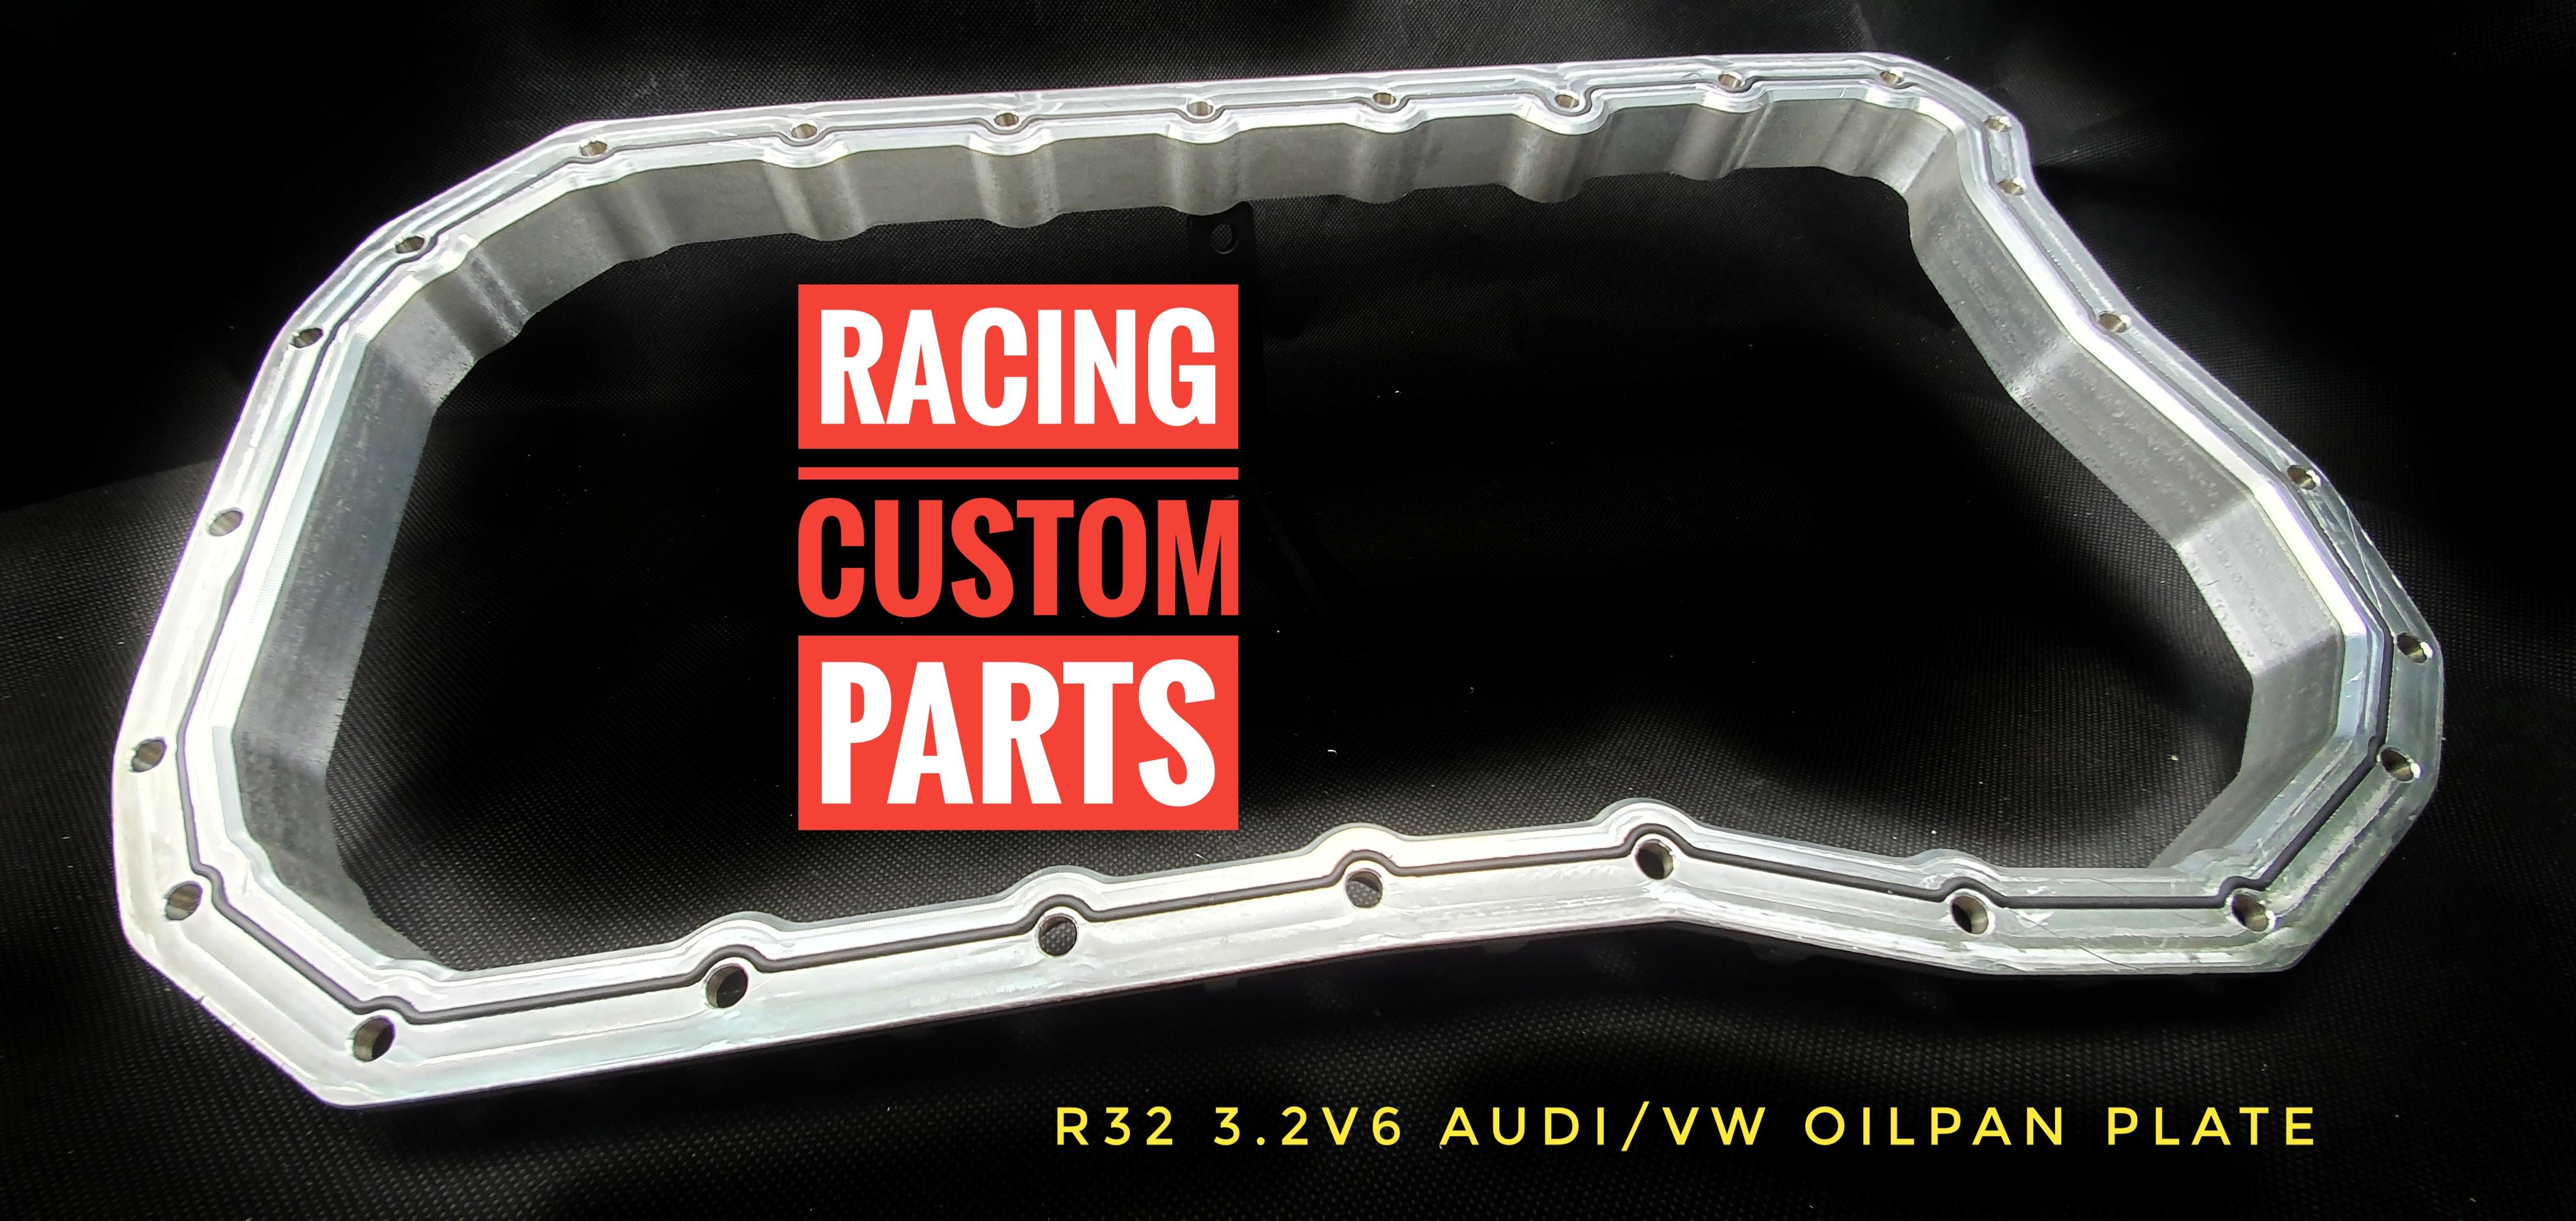 r32 oil pan billet plate racing custom barts r32 turbo audi vw billet cnc